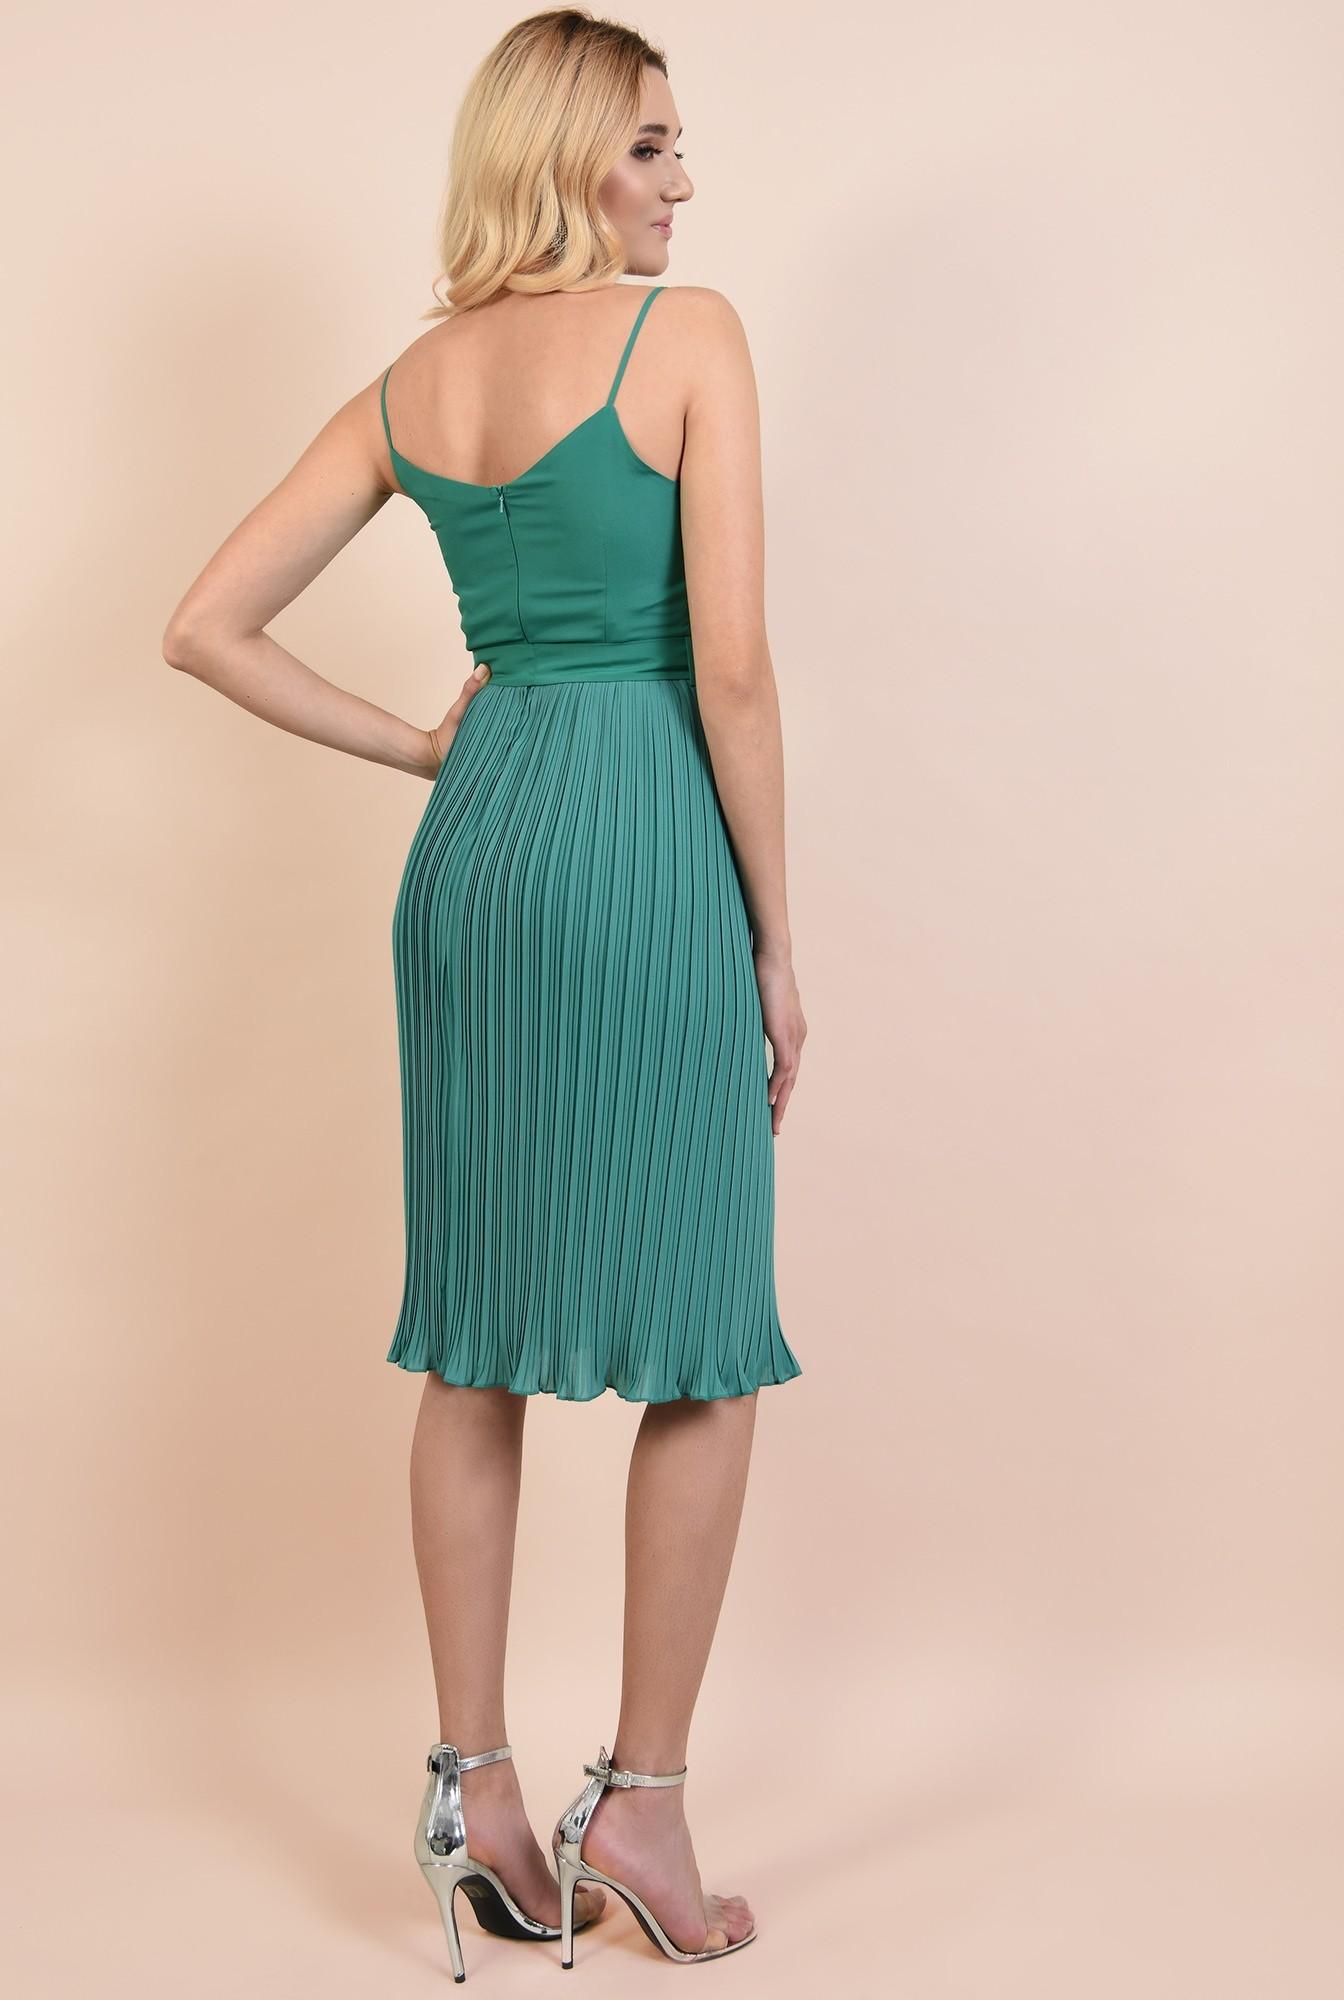 1 - rochie eleganta, midi, din voal plise, cu cordon, verde turcoaz